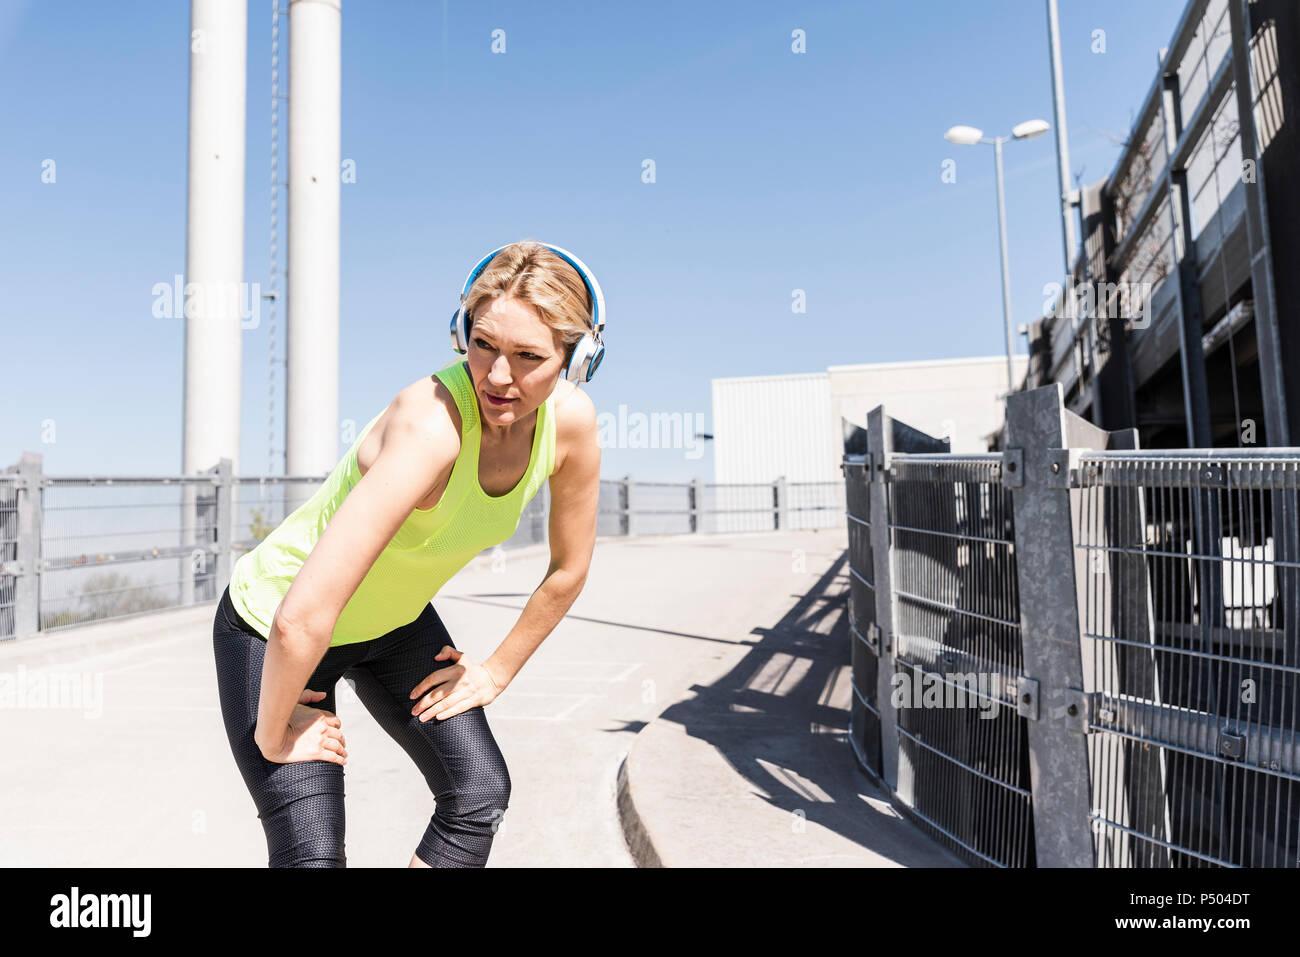 Woman jogging in the city, taking a break Stock Photo